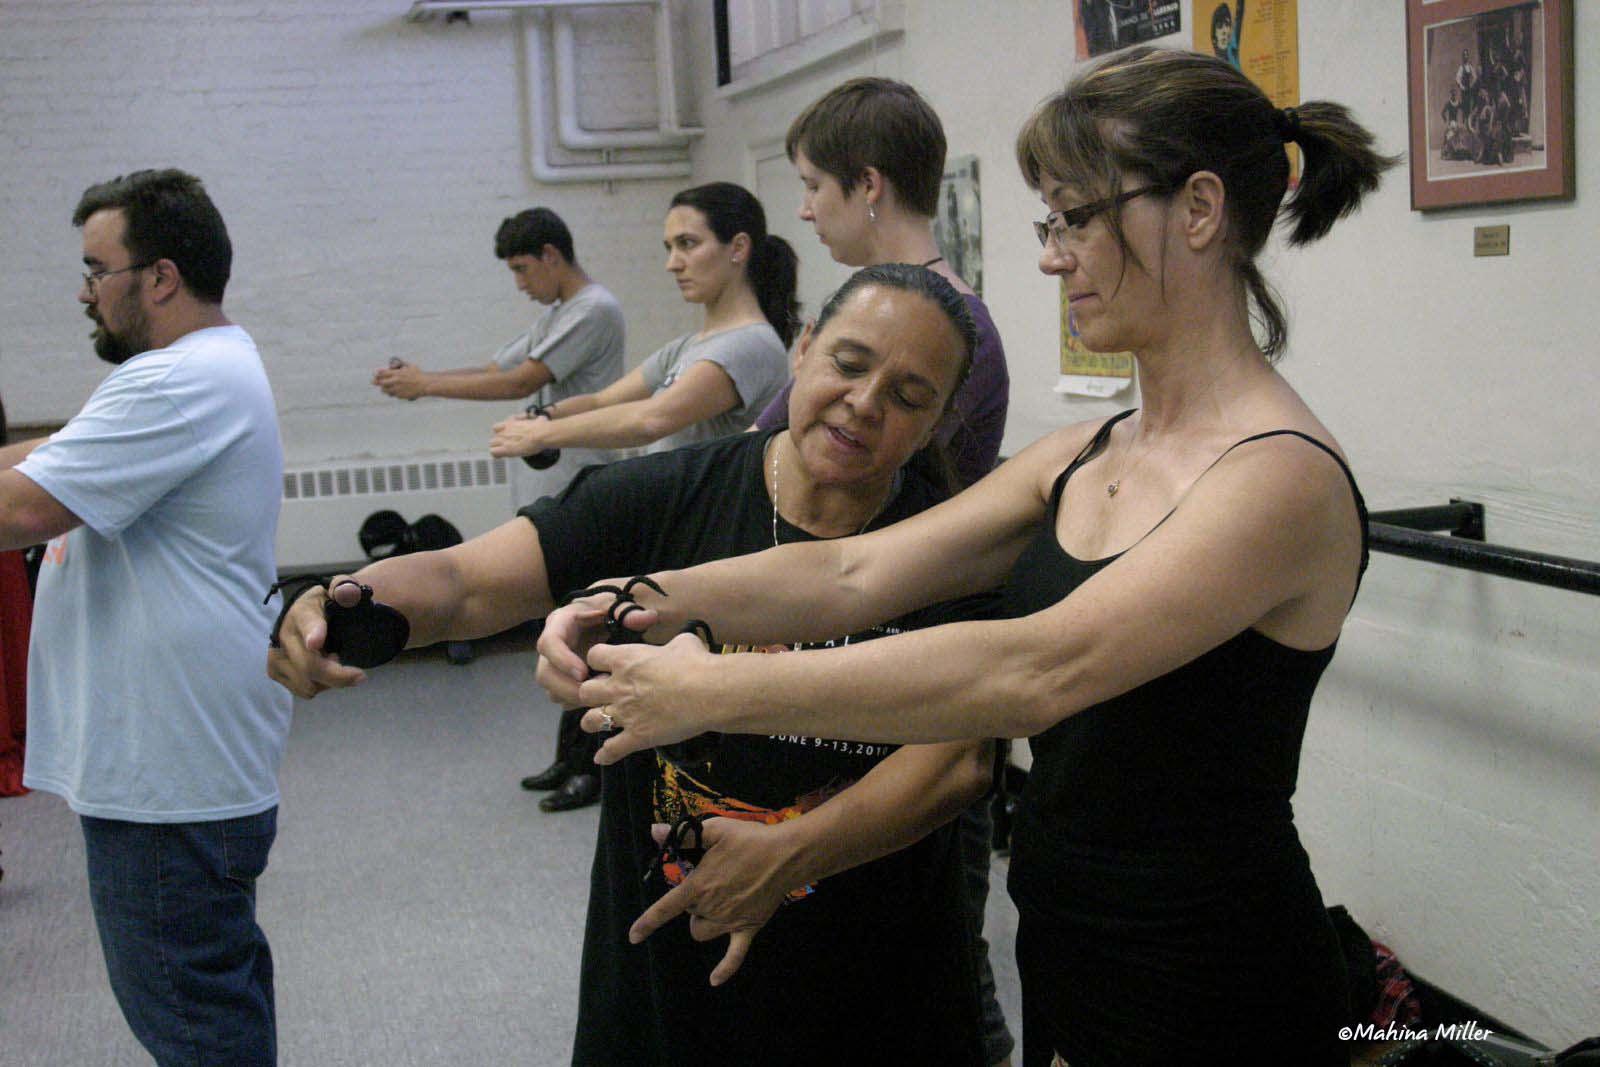 National Institute of Flamenco, Eva Encinias Sandoval teaching at the Festival Flamenco Internacional in Albuquerque, NM